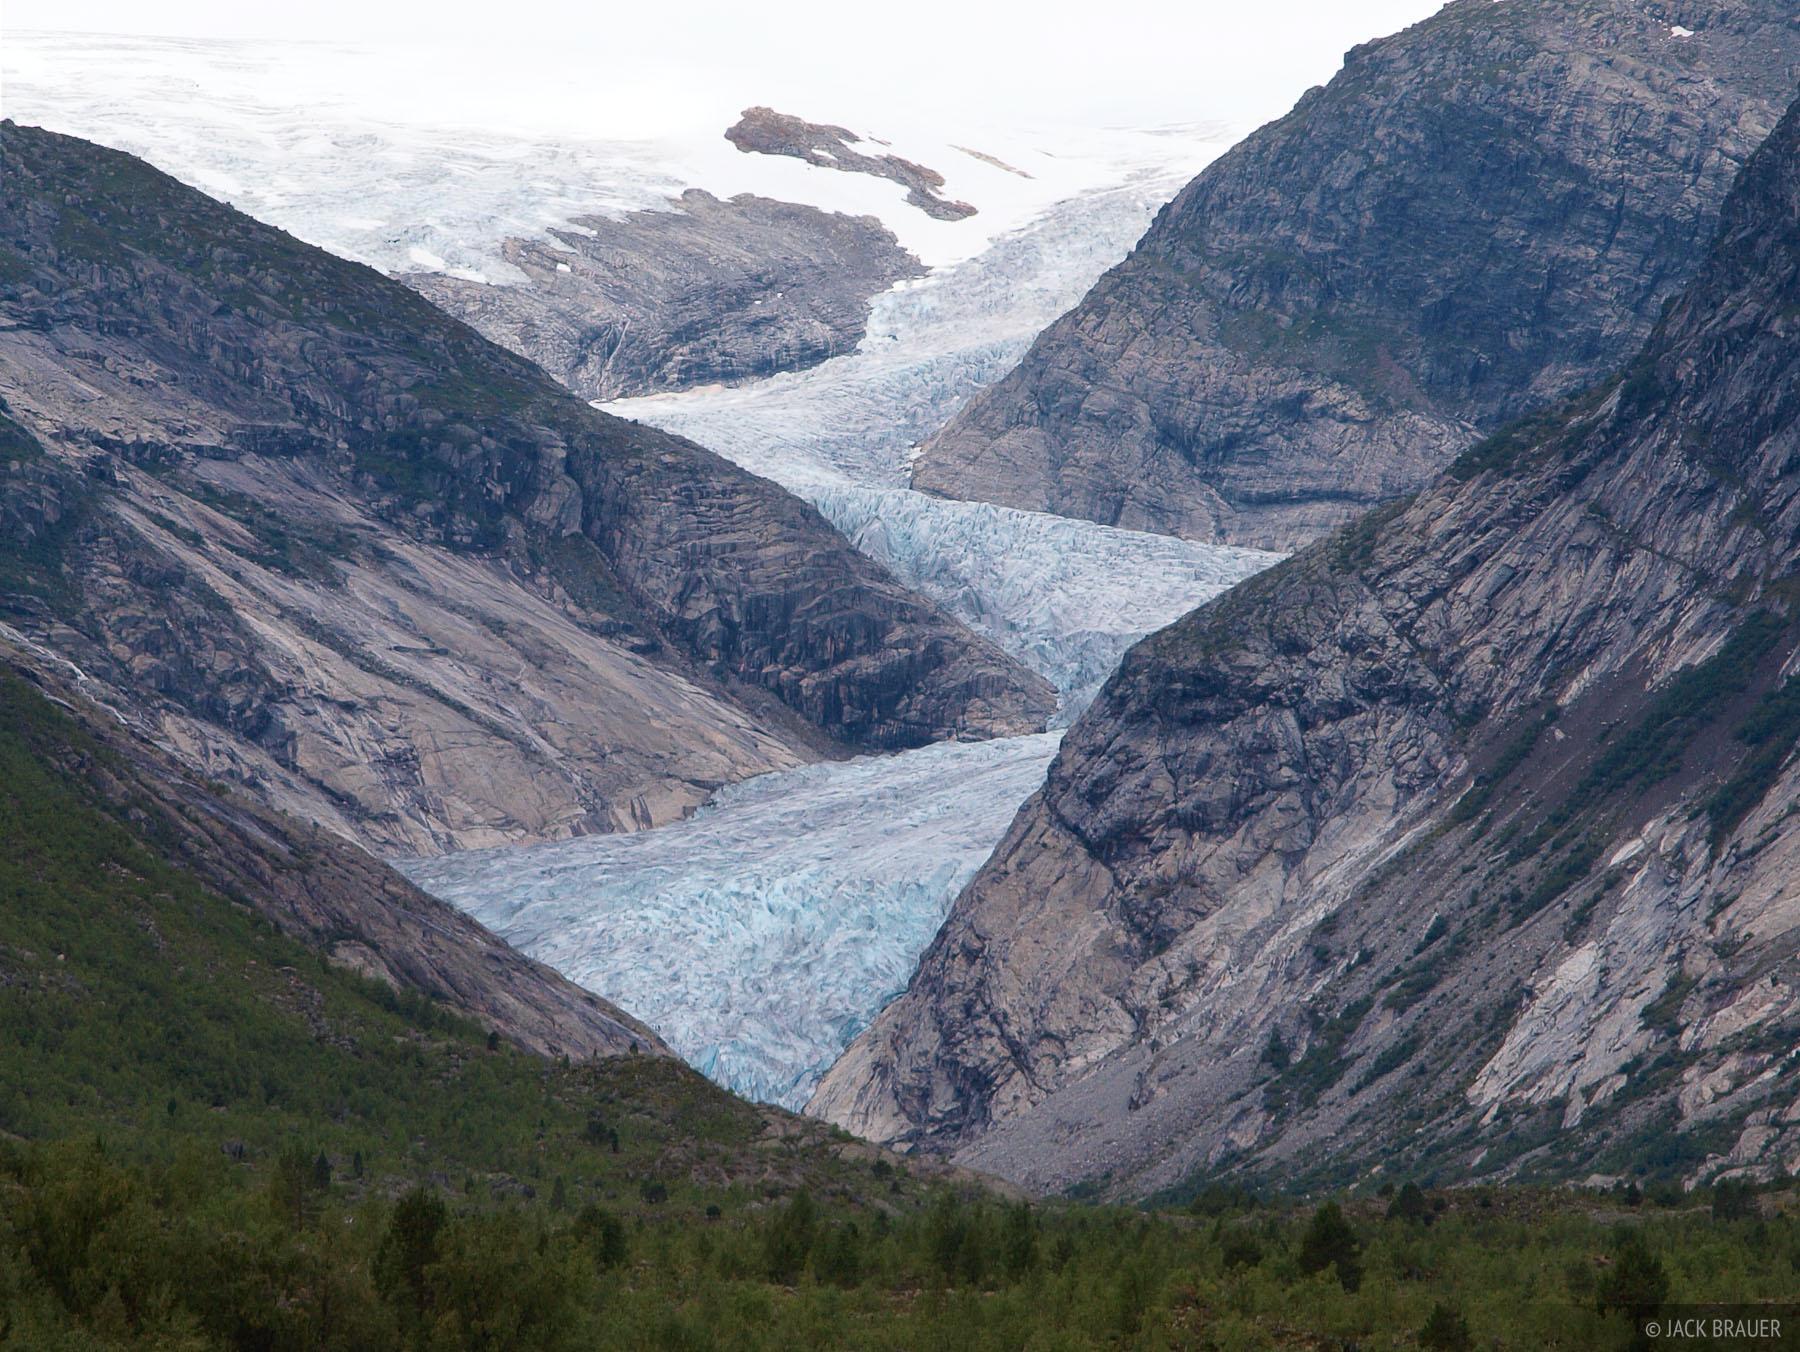 Nigardsbreen, glacier, Jostedalsbreen, Norway, photo